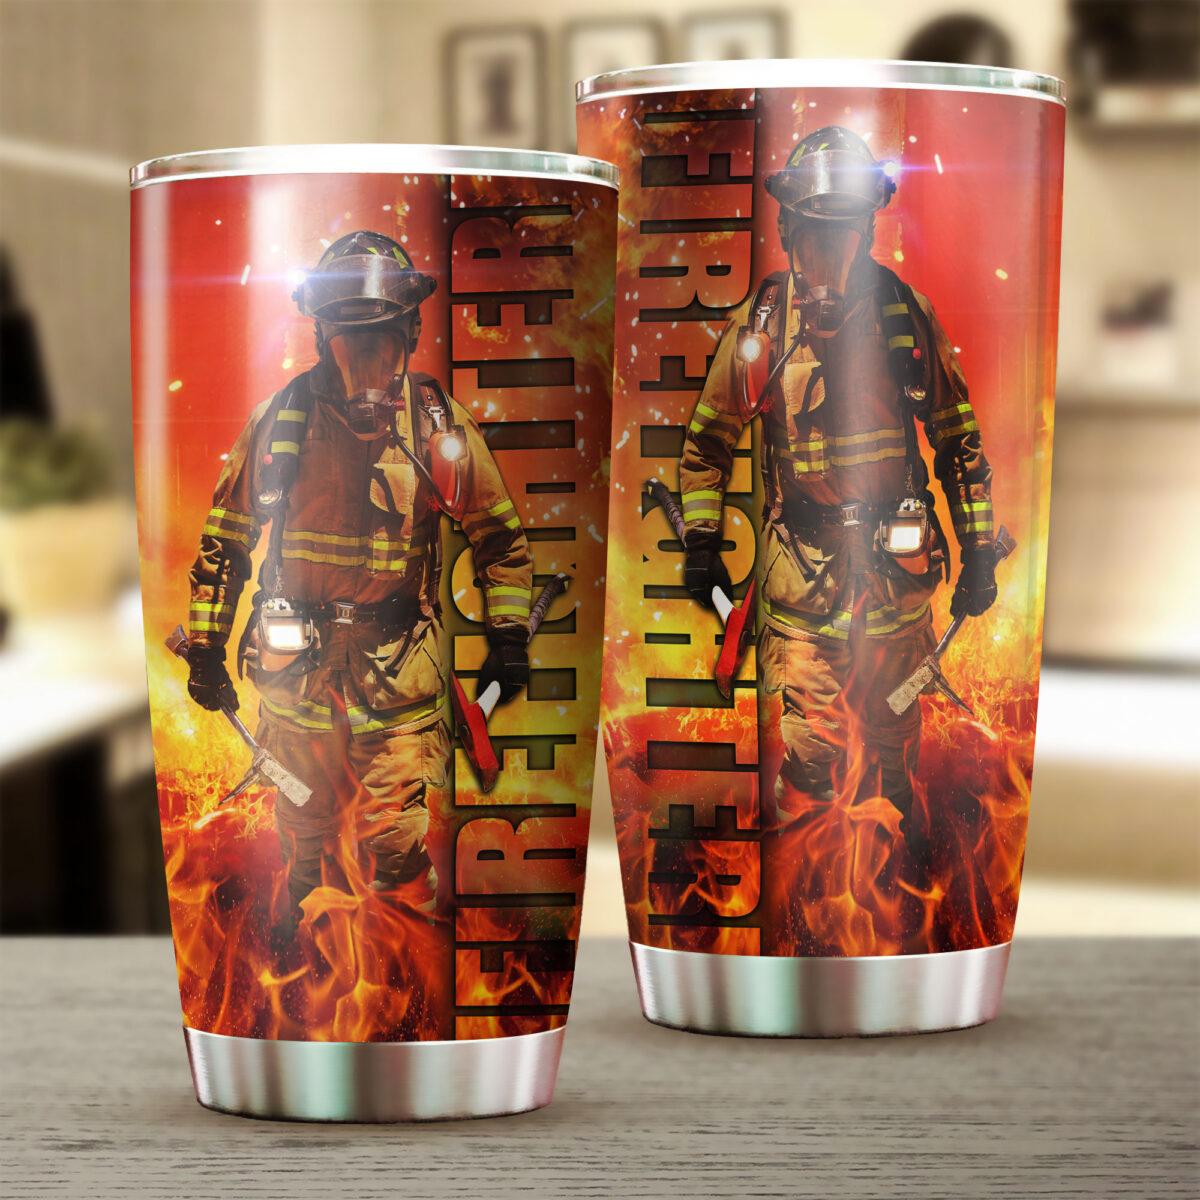 for firefighter all over print stainless steel tumbler 2